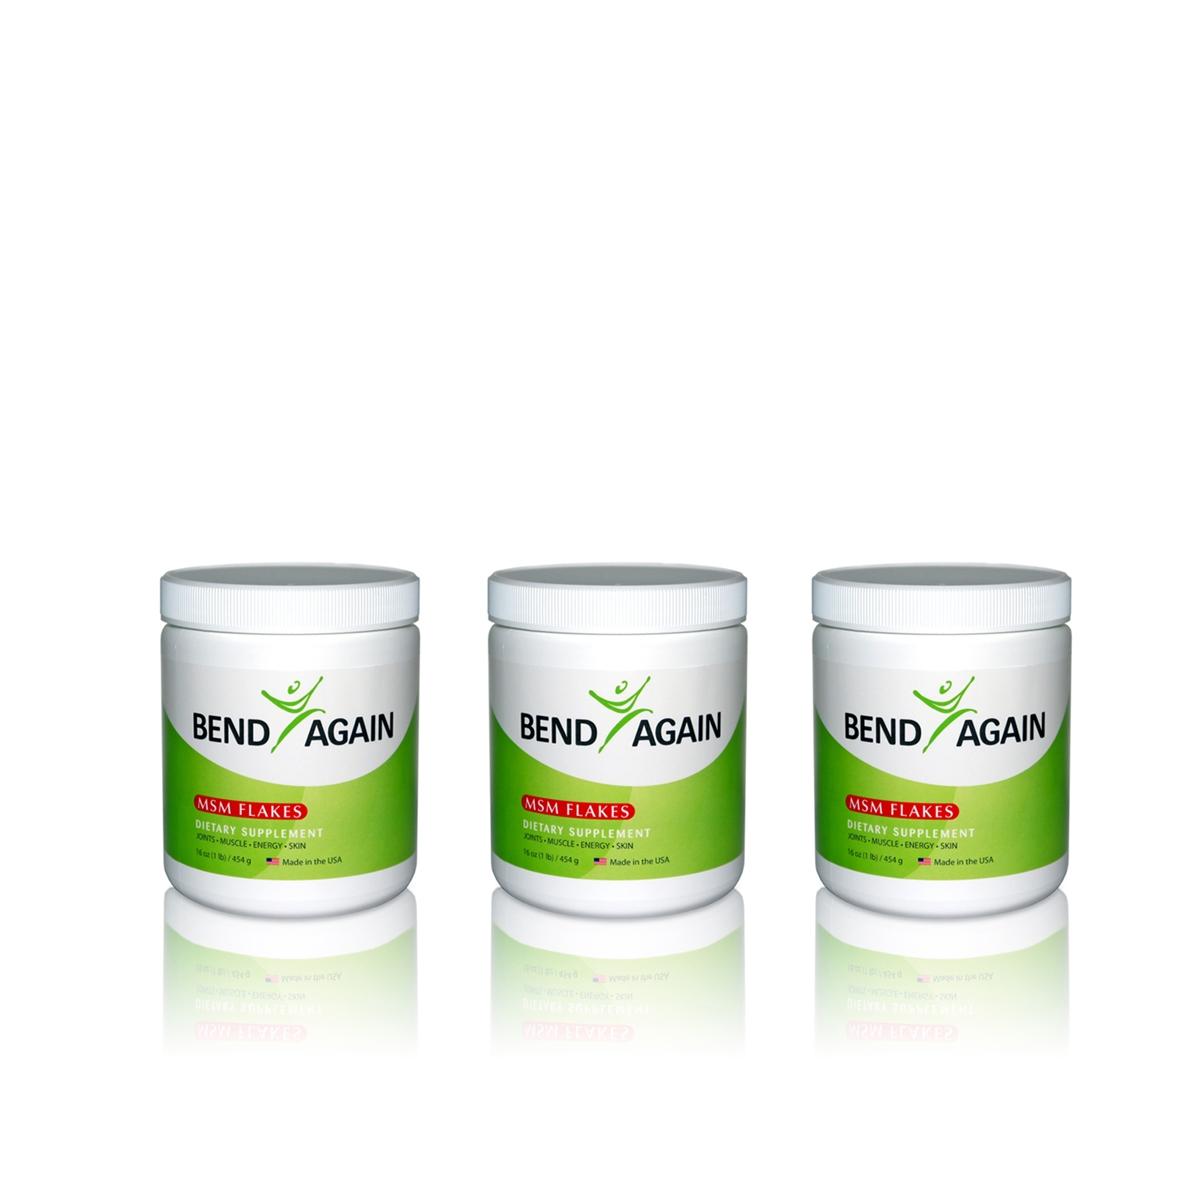 One-Year Supply of Bend Again MSM Bulk Flakes (375 servings)